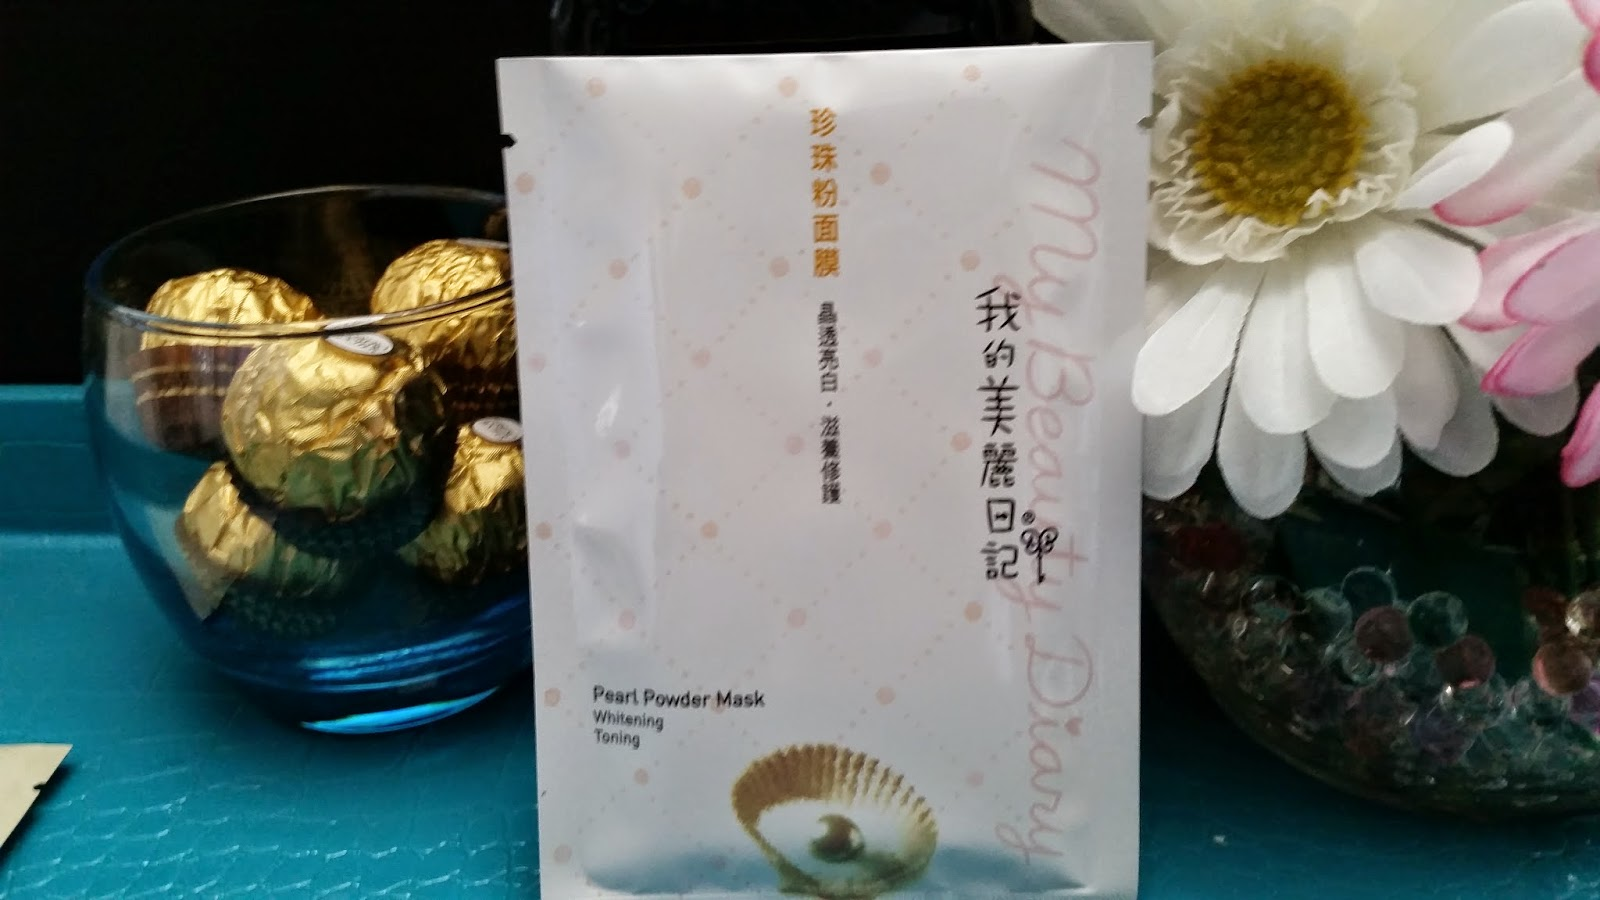 Pearl Powder Mask